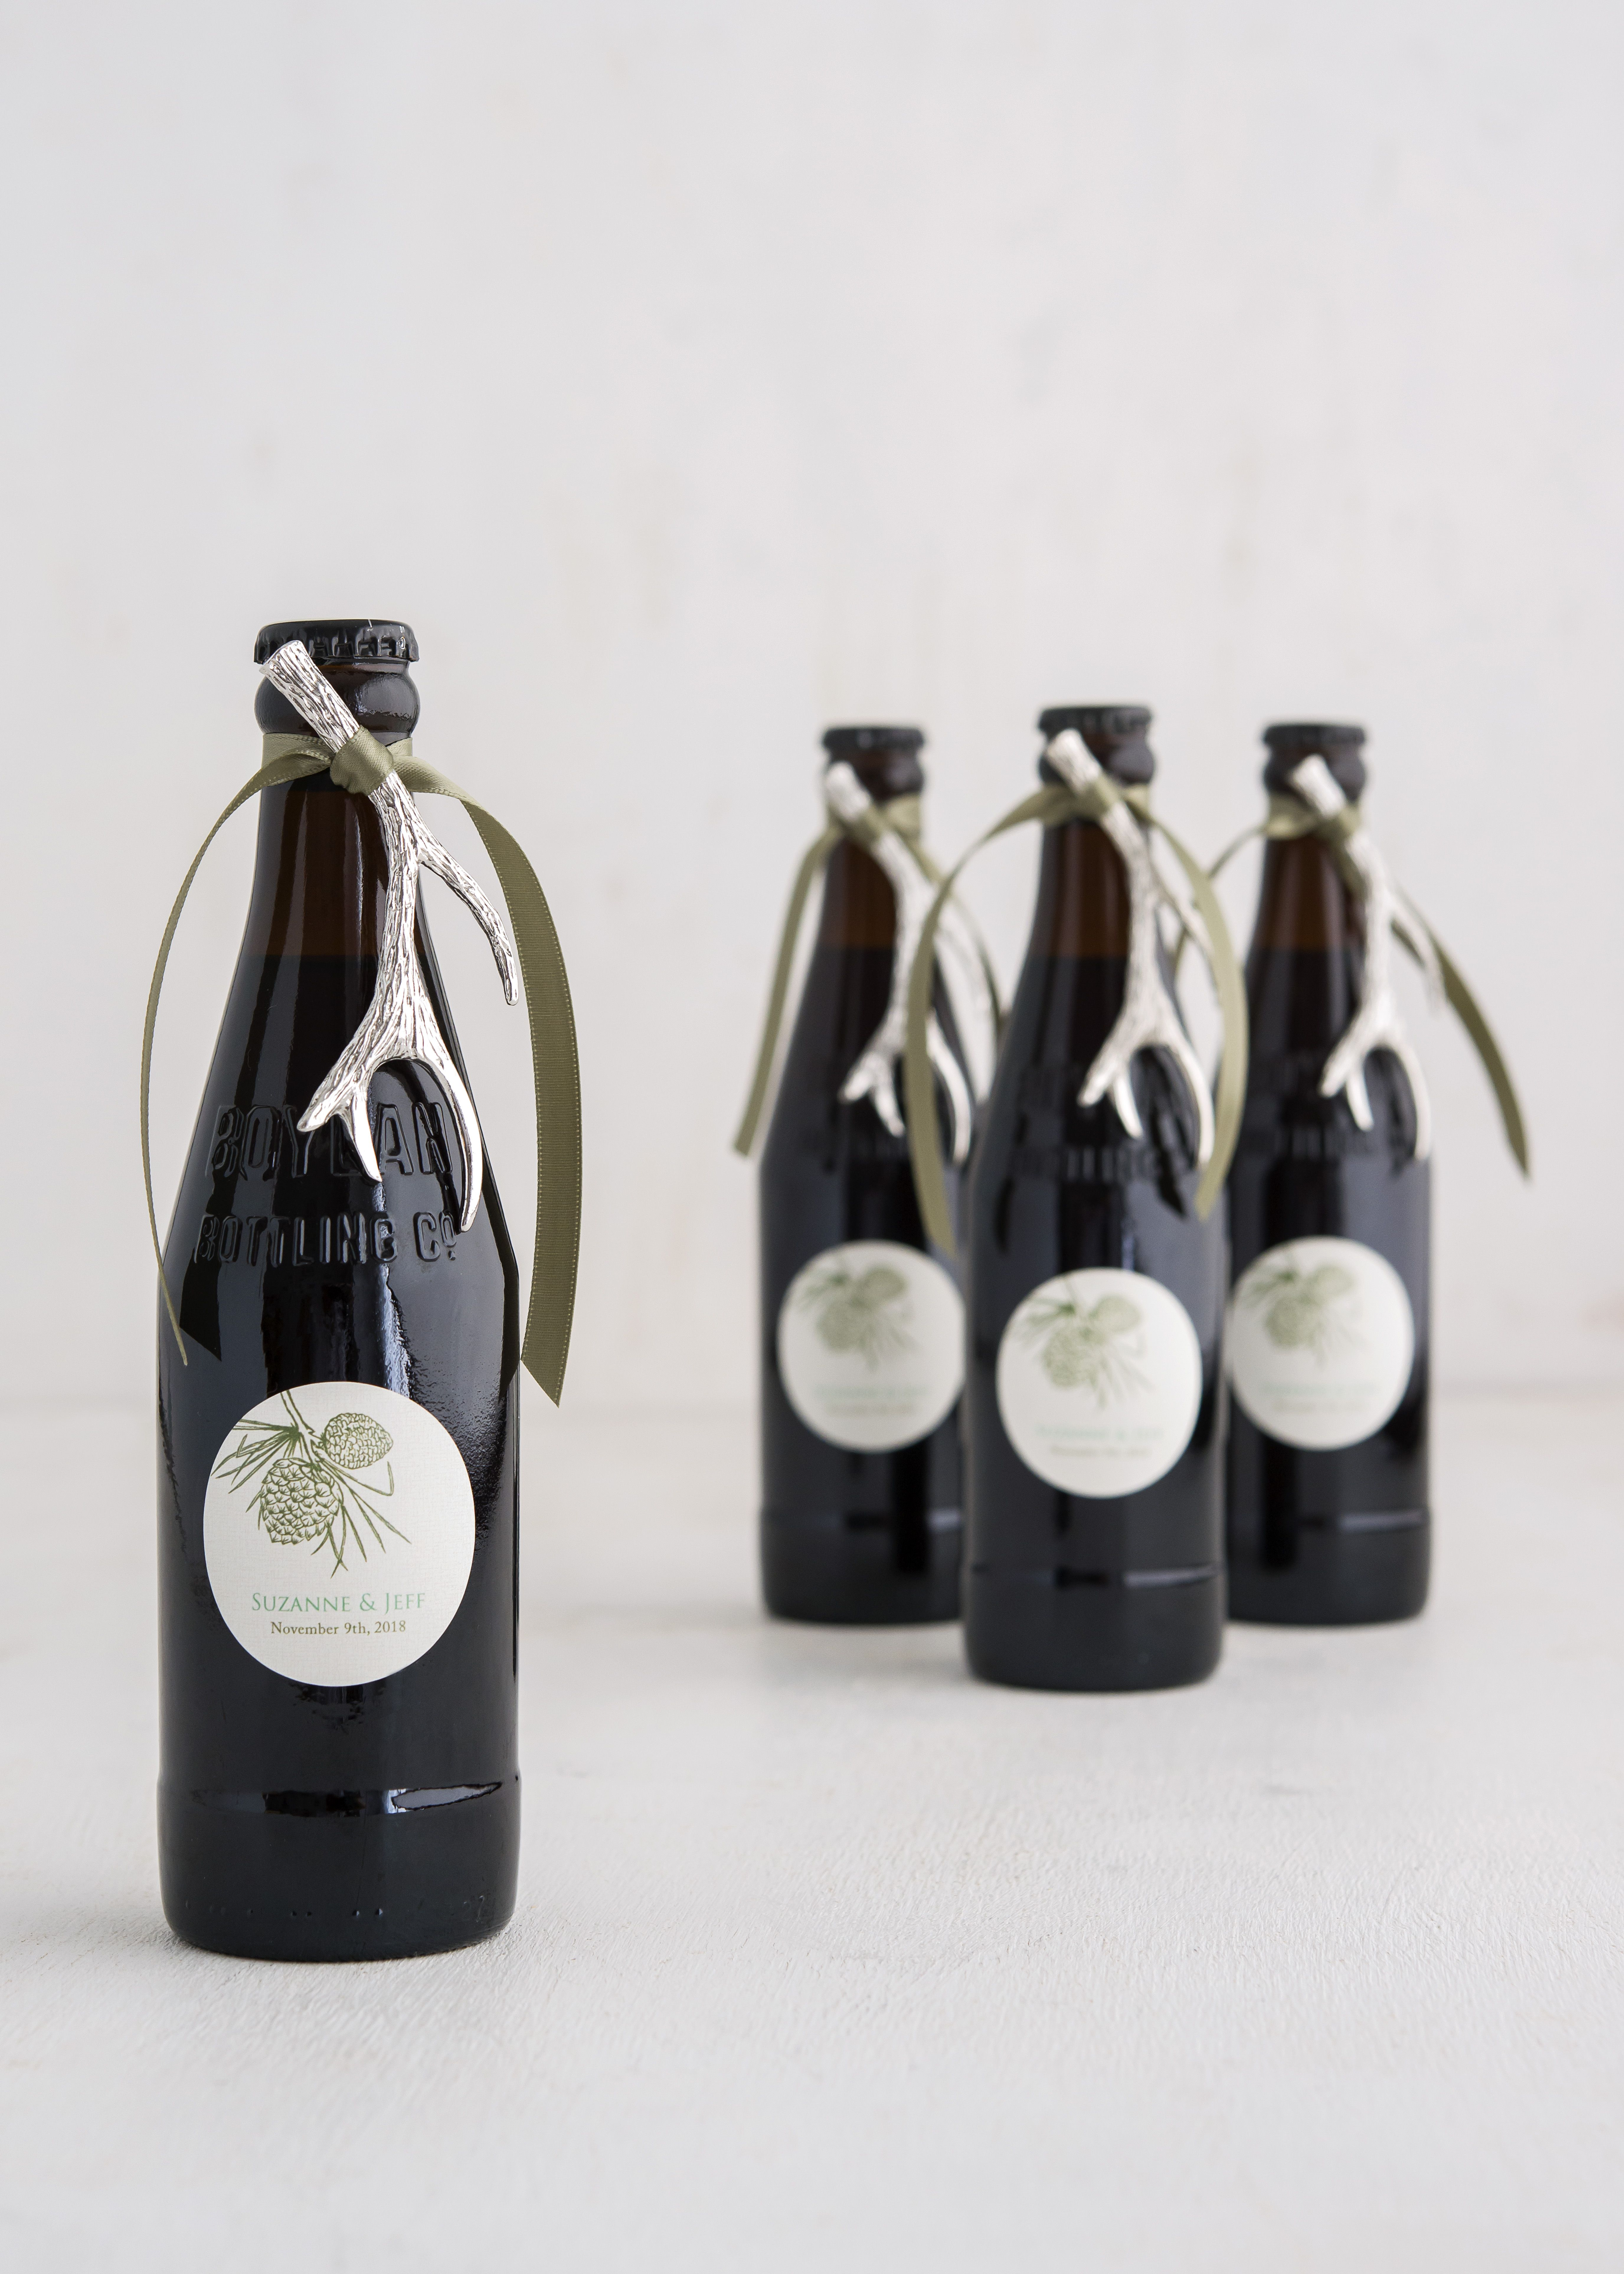 Silver Antler Bottle Opener Favor | Antlers, Favors and Weddings